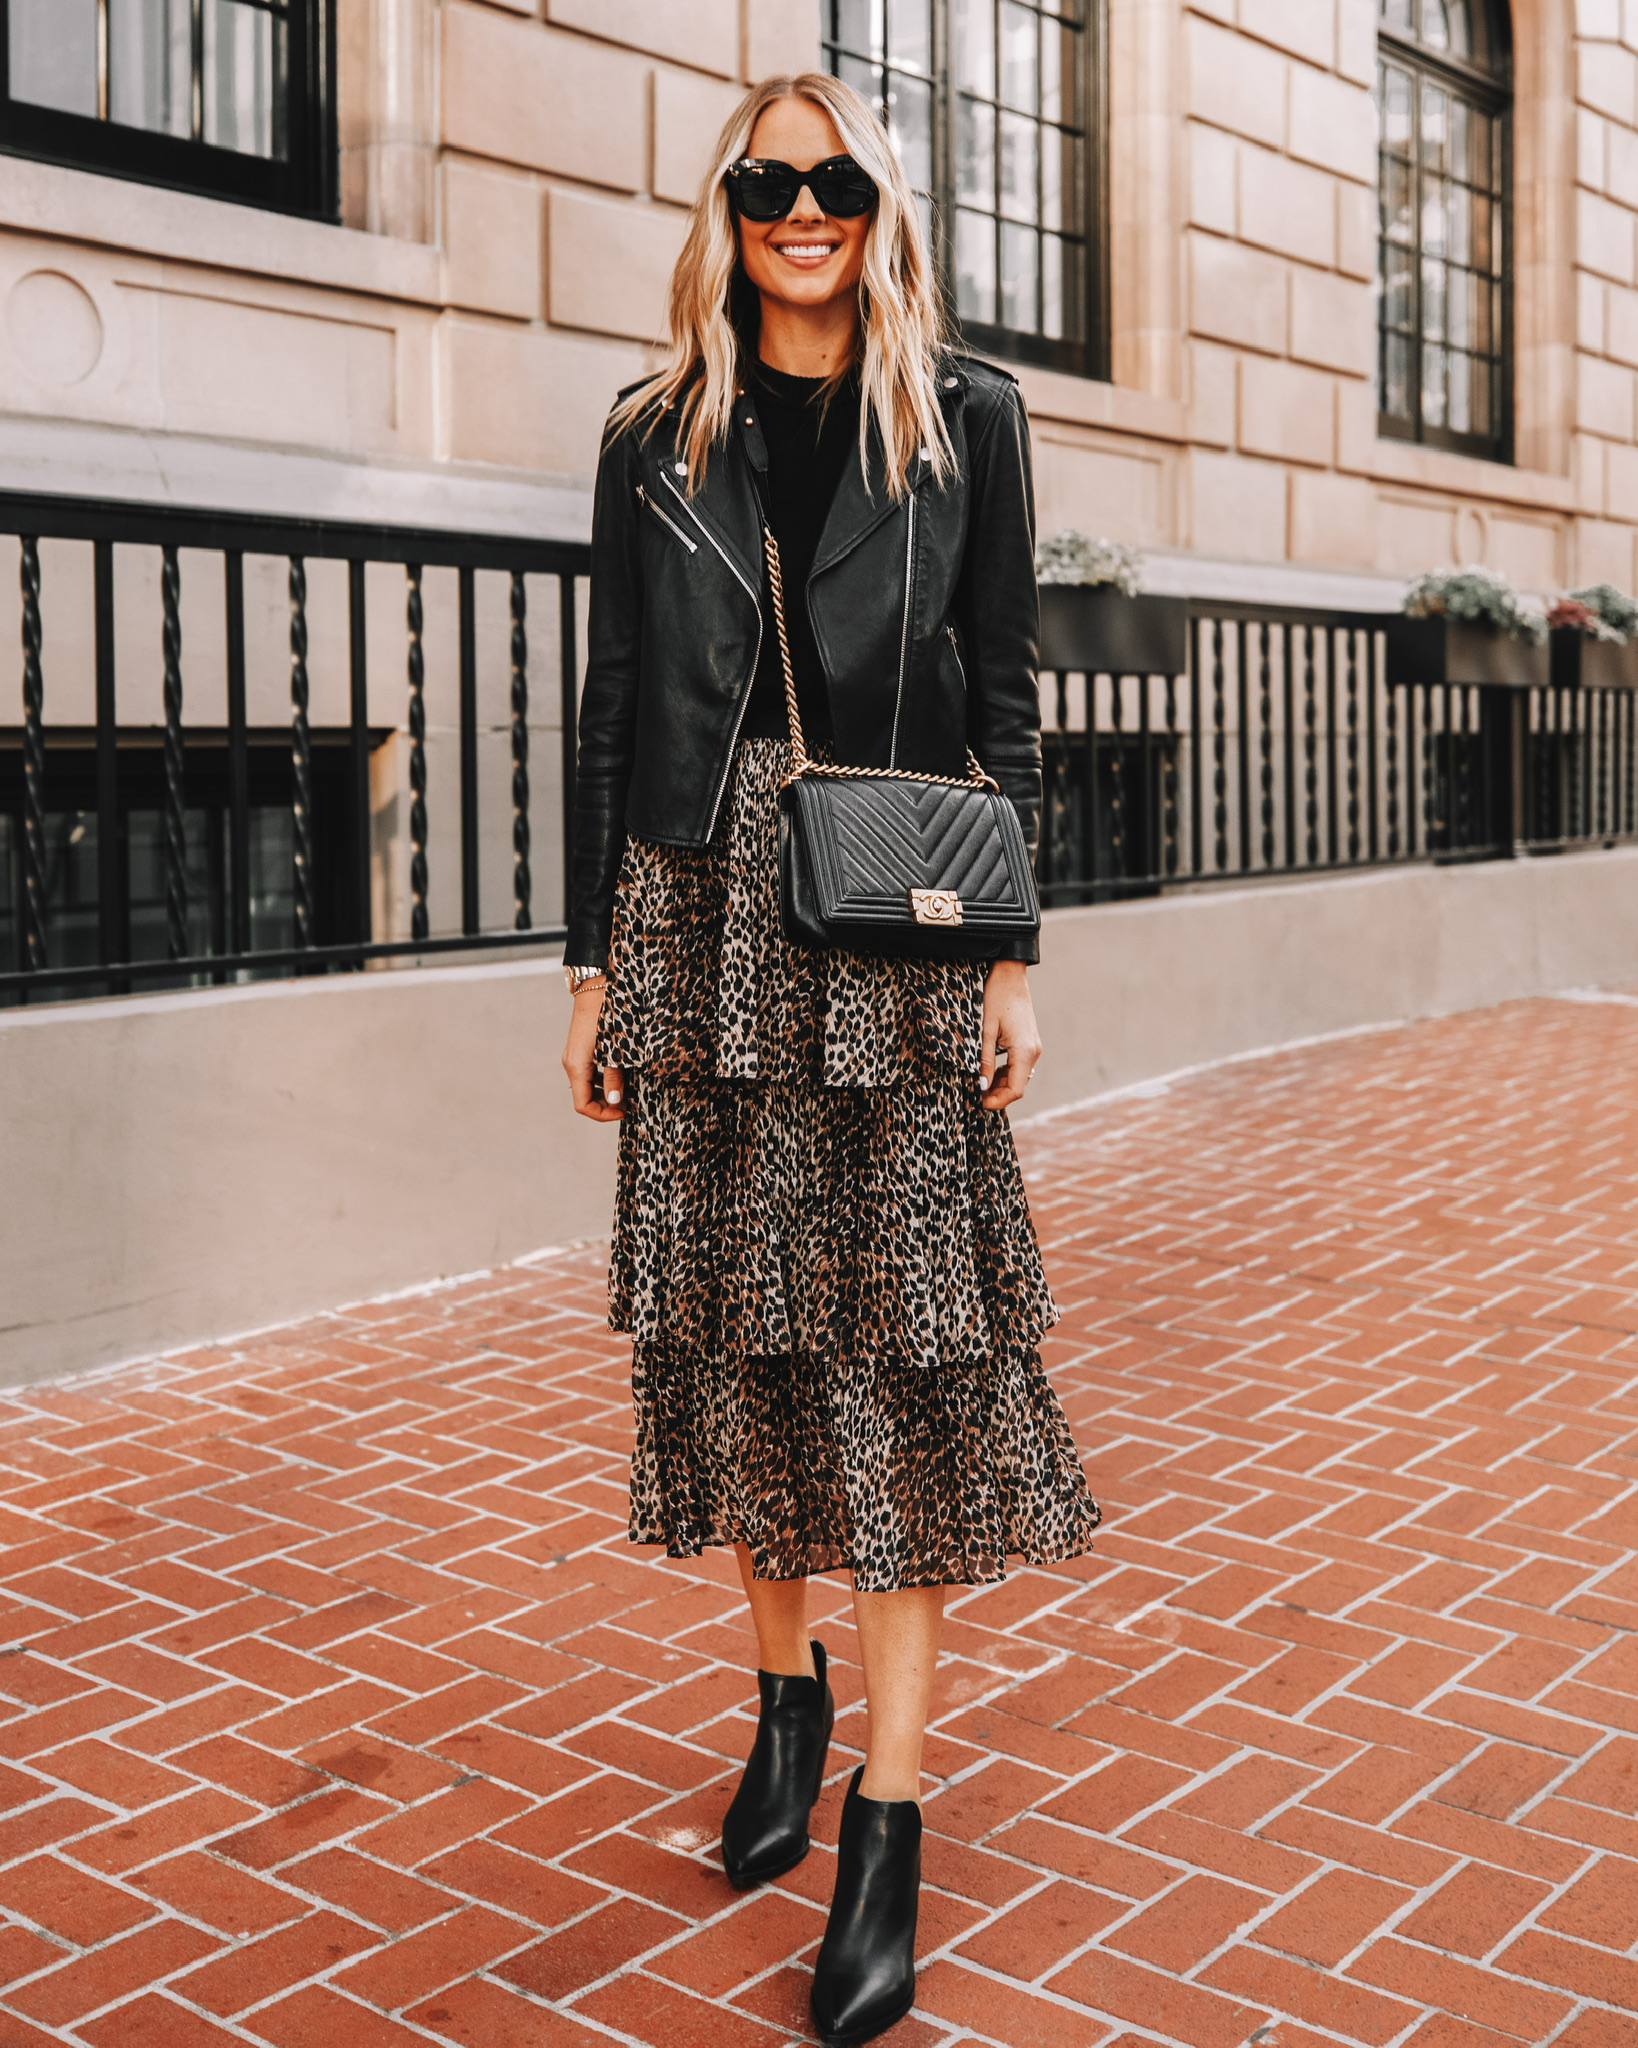 Fashion Jackson Wearing Black Leather Jacket Outfit Leopard Midi Skirt Black Leather Boots